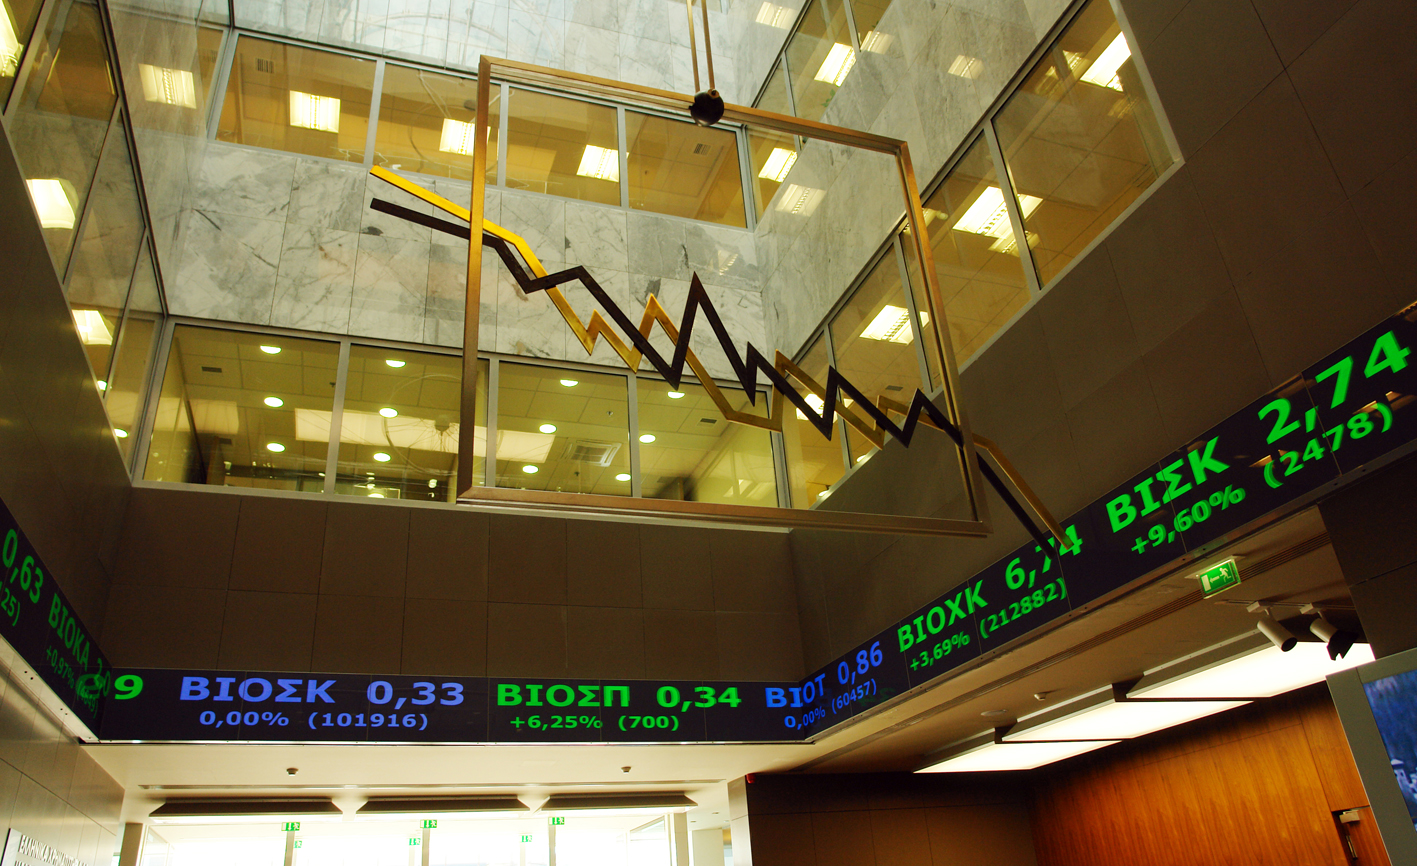 AXIA Numbers Νοεμβρίου 2020: Στο 48,4% αυξήθηκαν οι συναλλαγές των ξένων στο ΧΑ